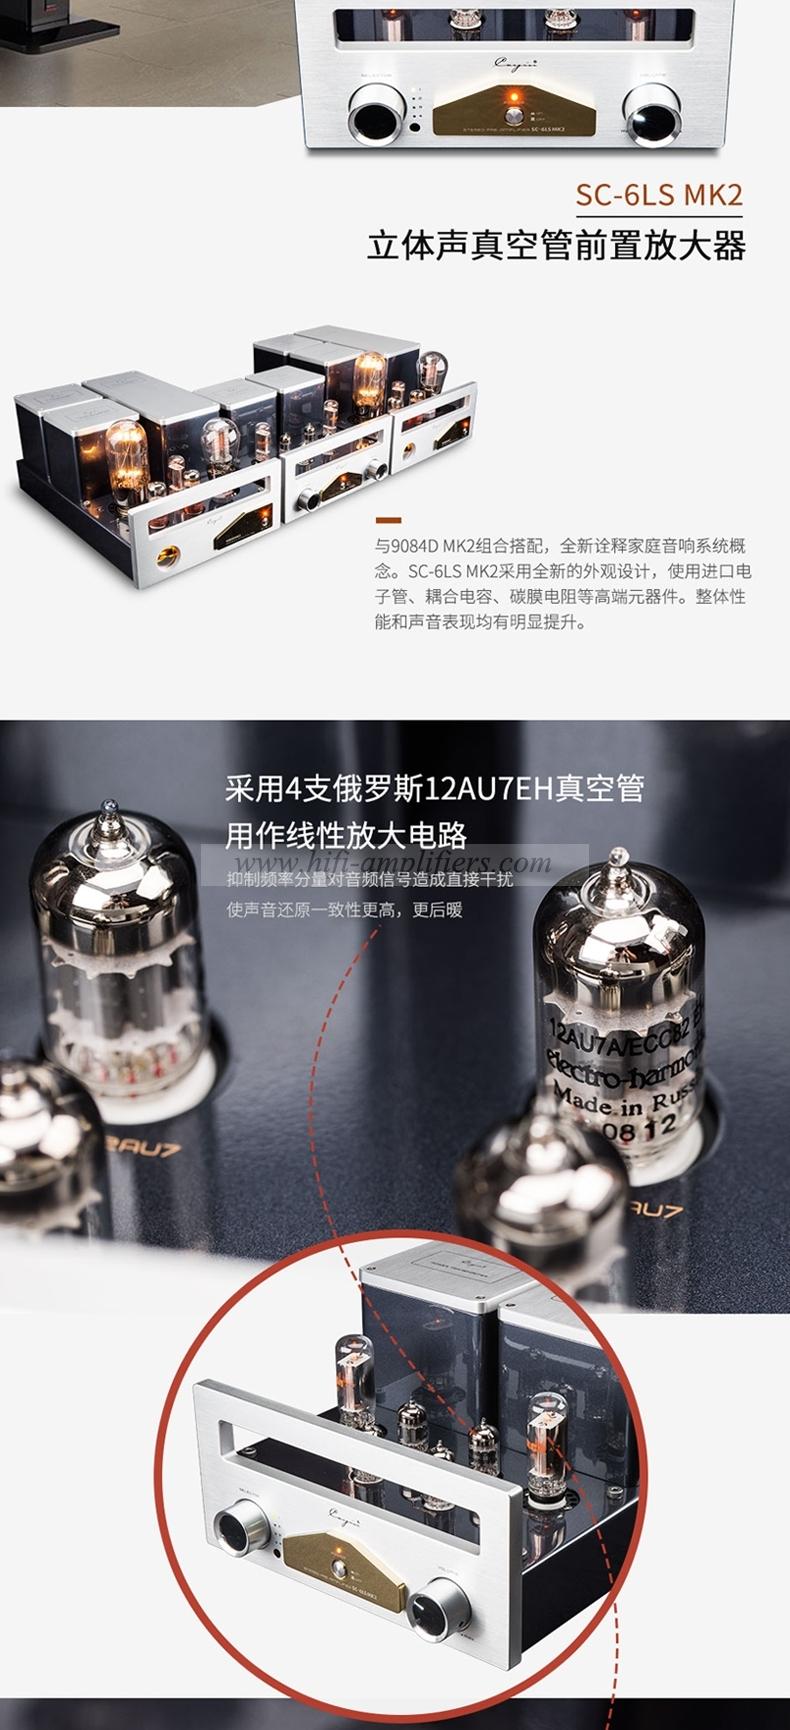 Cayin SC-6LS MK2 12AU7 EH tube Stereo preamp HiFi Valve Pre-amplifier